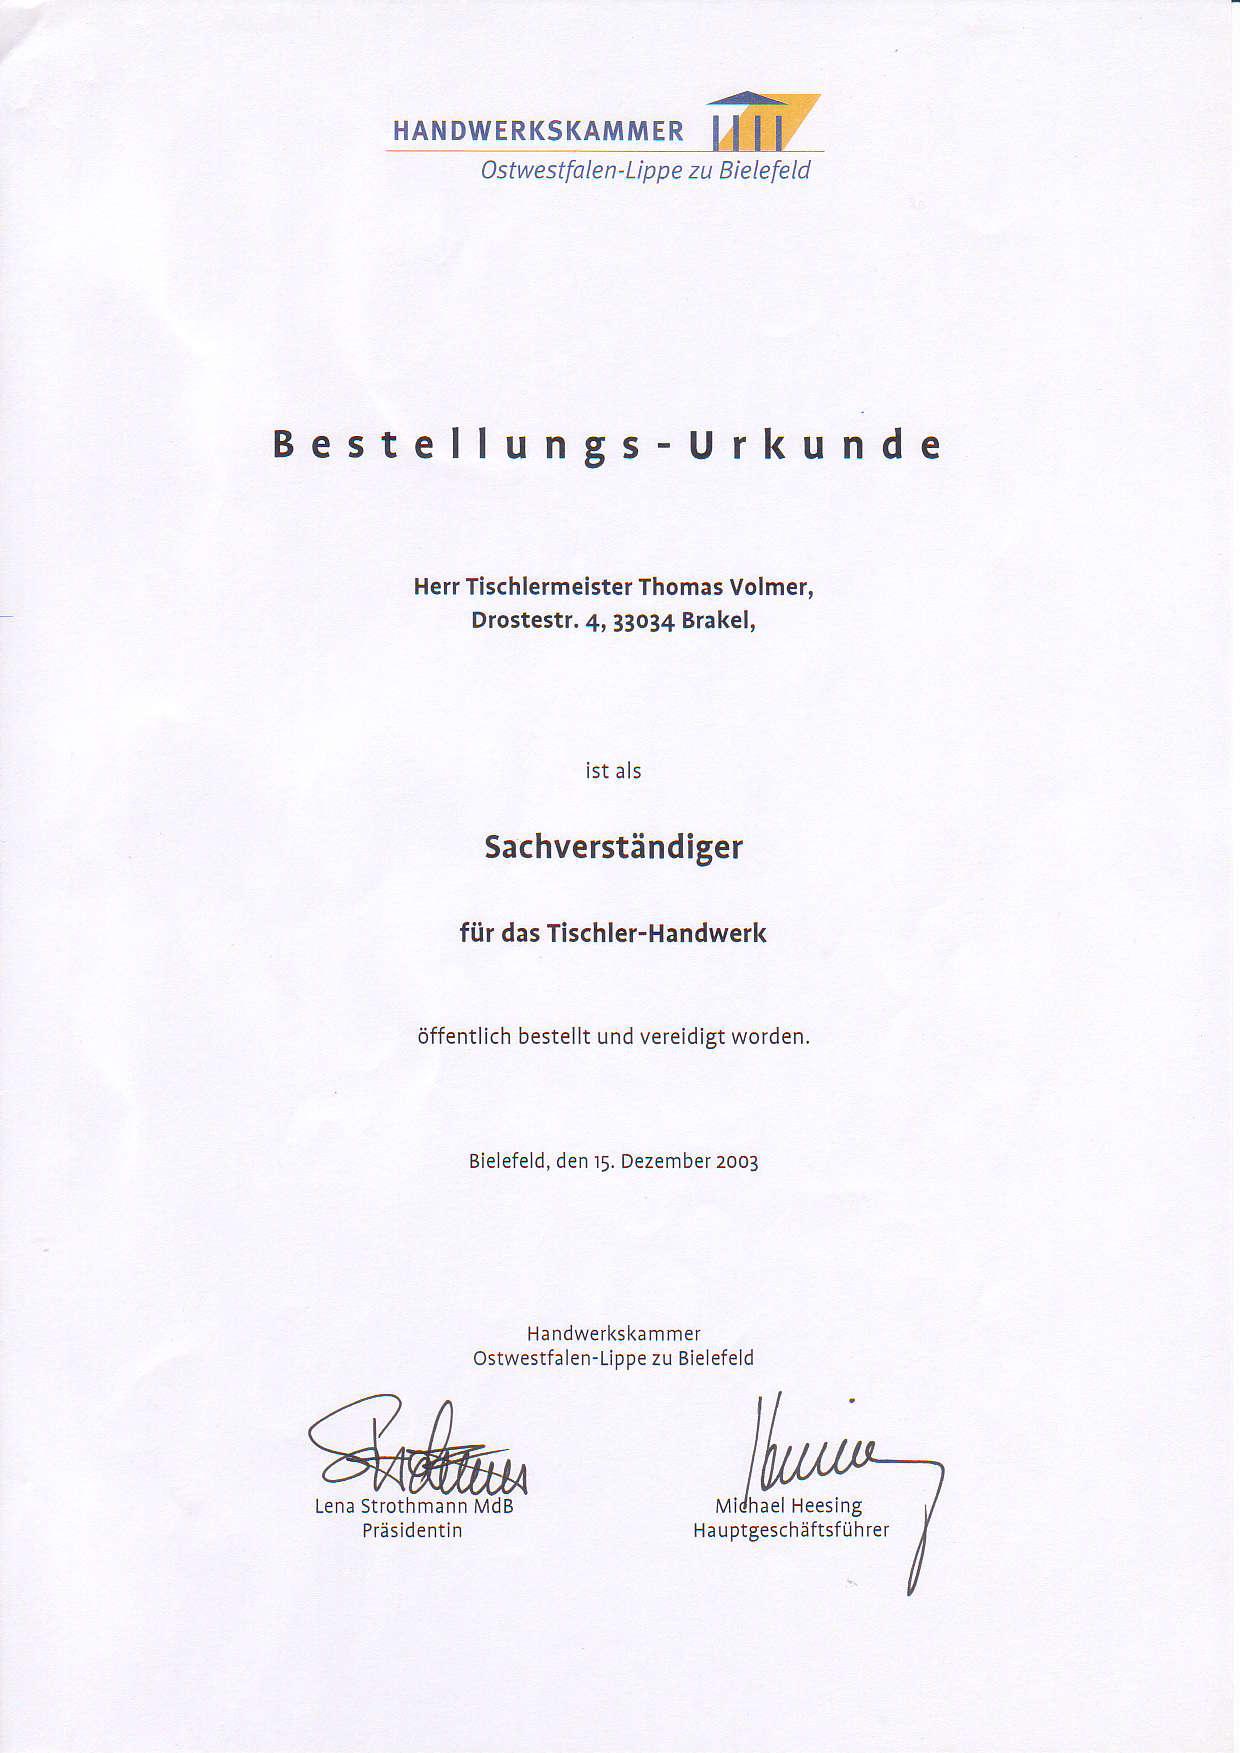 sv_vereidigung_handwerkskammer03